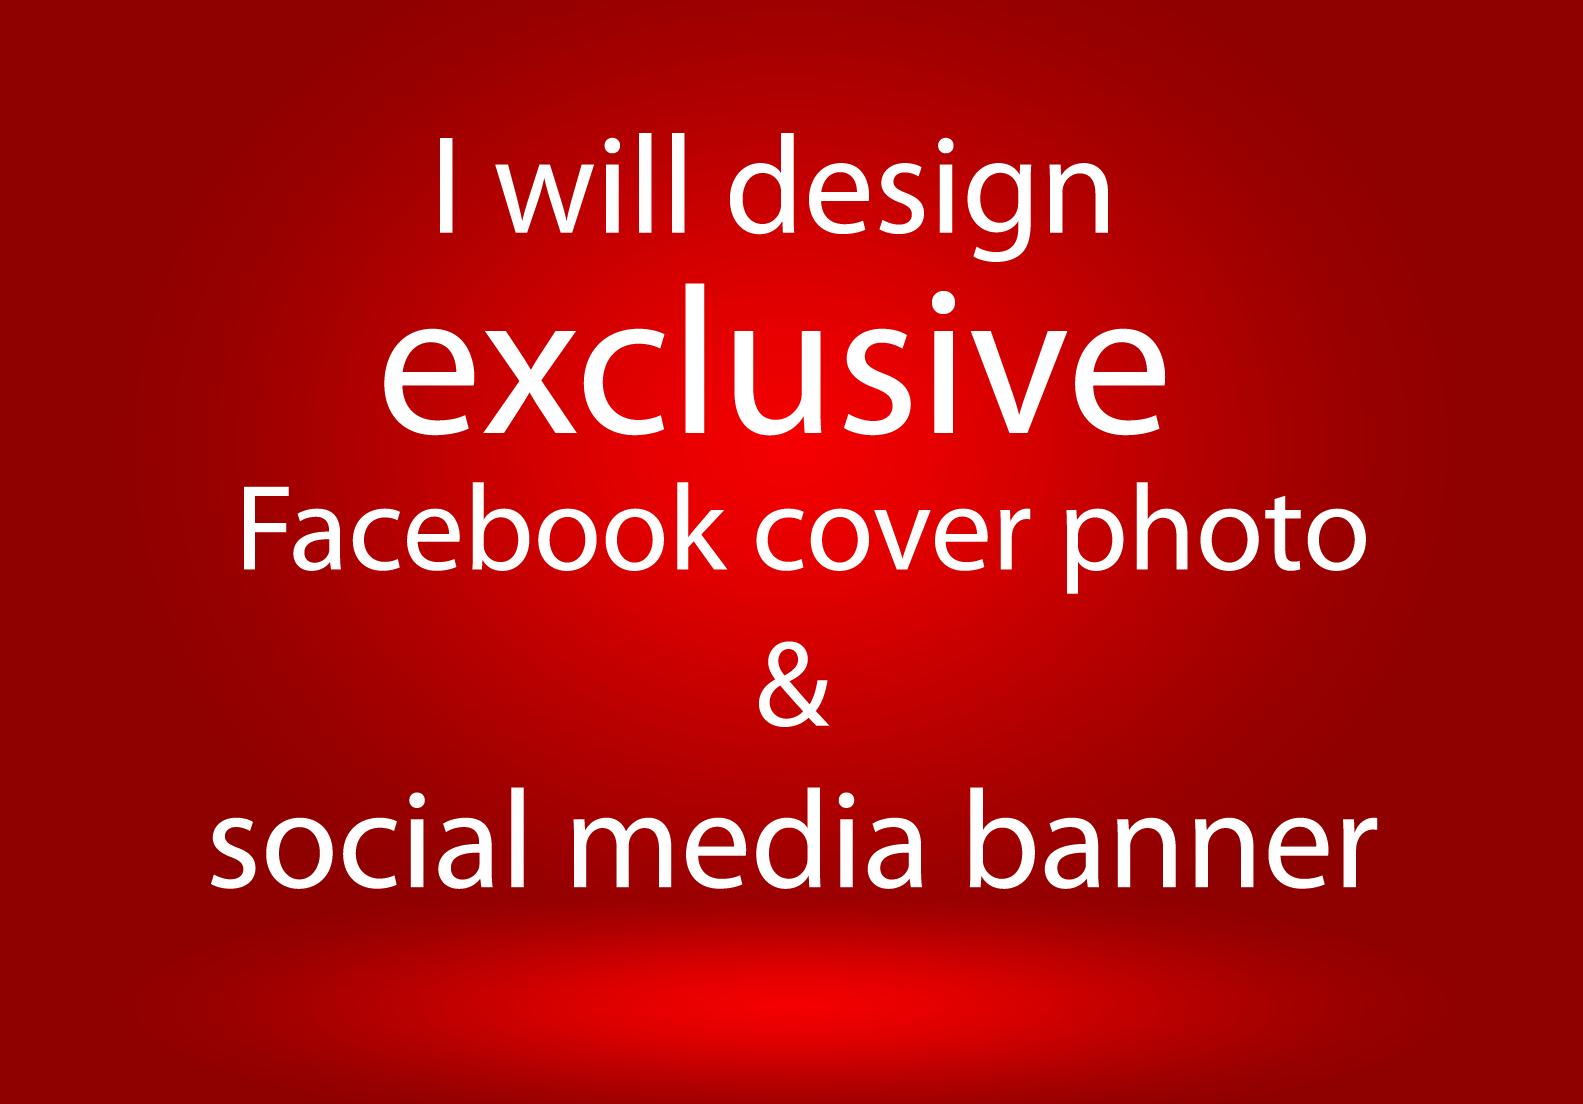 I will design exclusive Facebook cover photo & social media banner